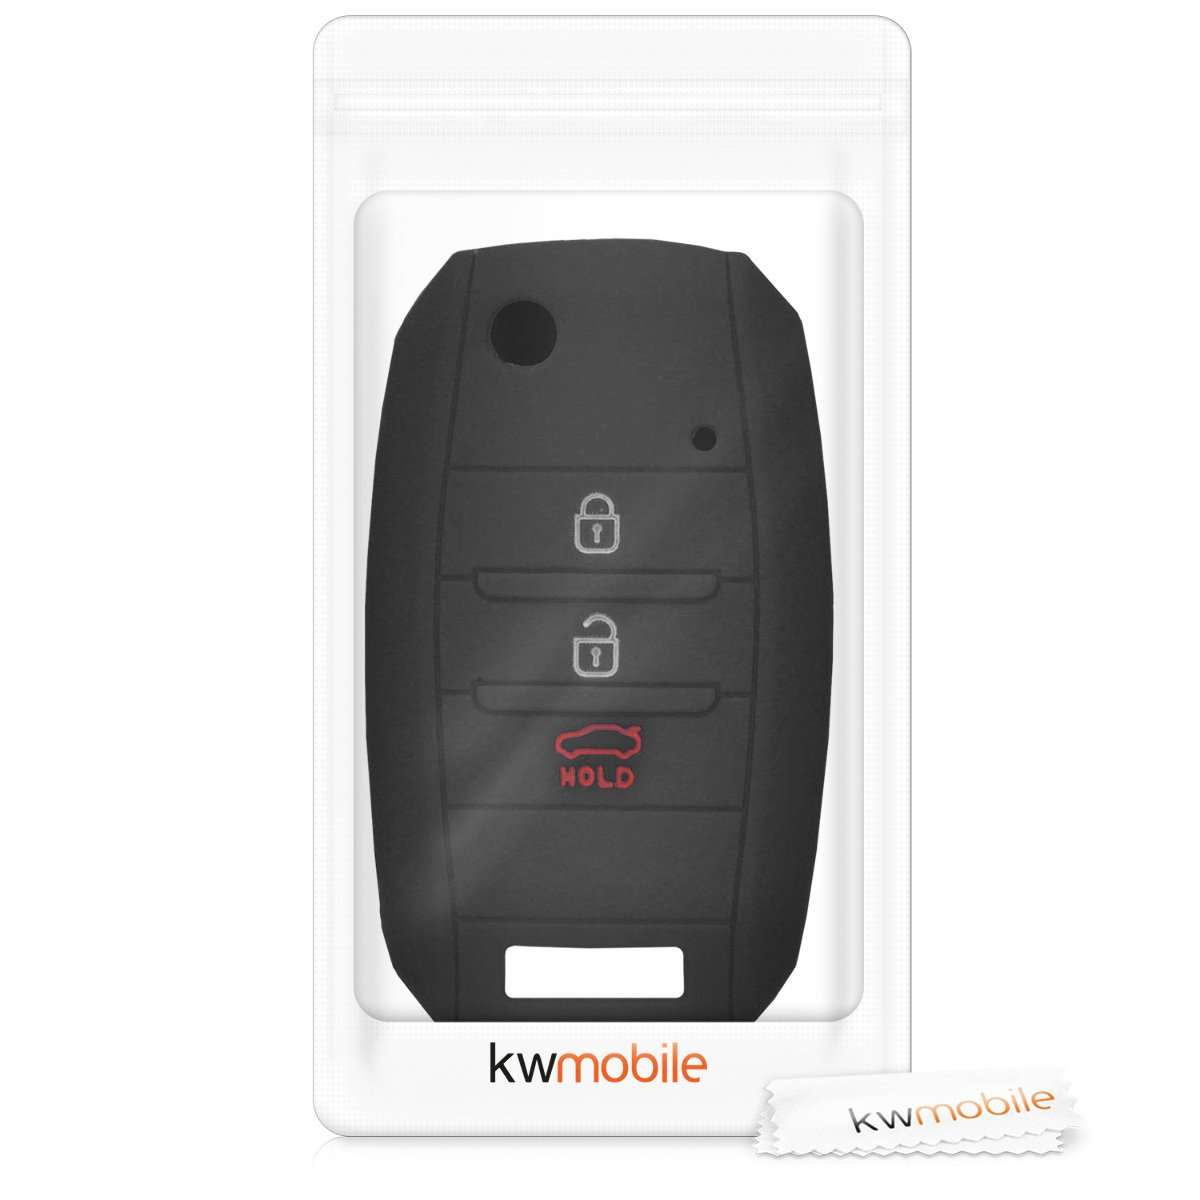 kwmobile Car Key Cover for Kia White//Dark Pink Silicone Protective Key Fob Cover for Kia 3-4 Button Car Key